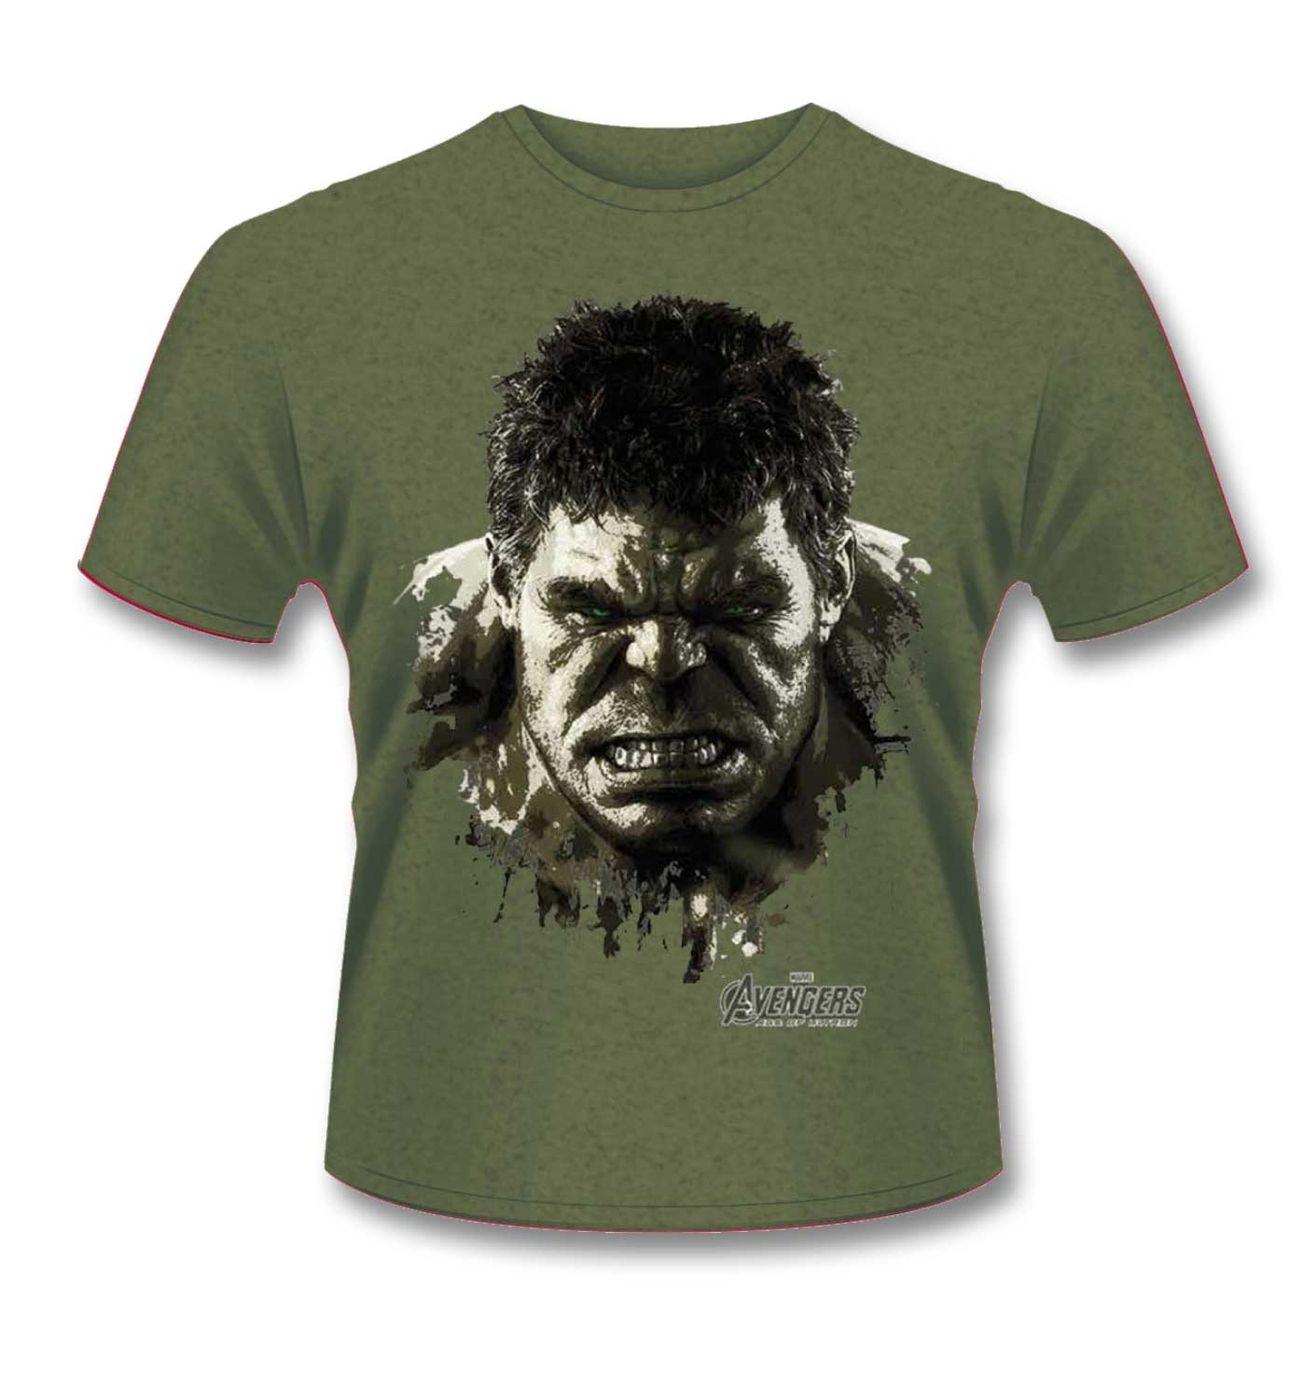 Hulk t-shirt - Official Avengers: Age Of Ultron Incredible Hulk tee